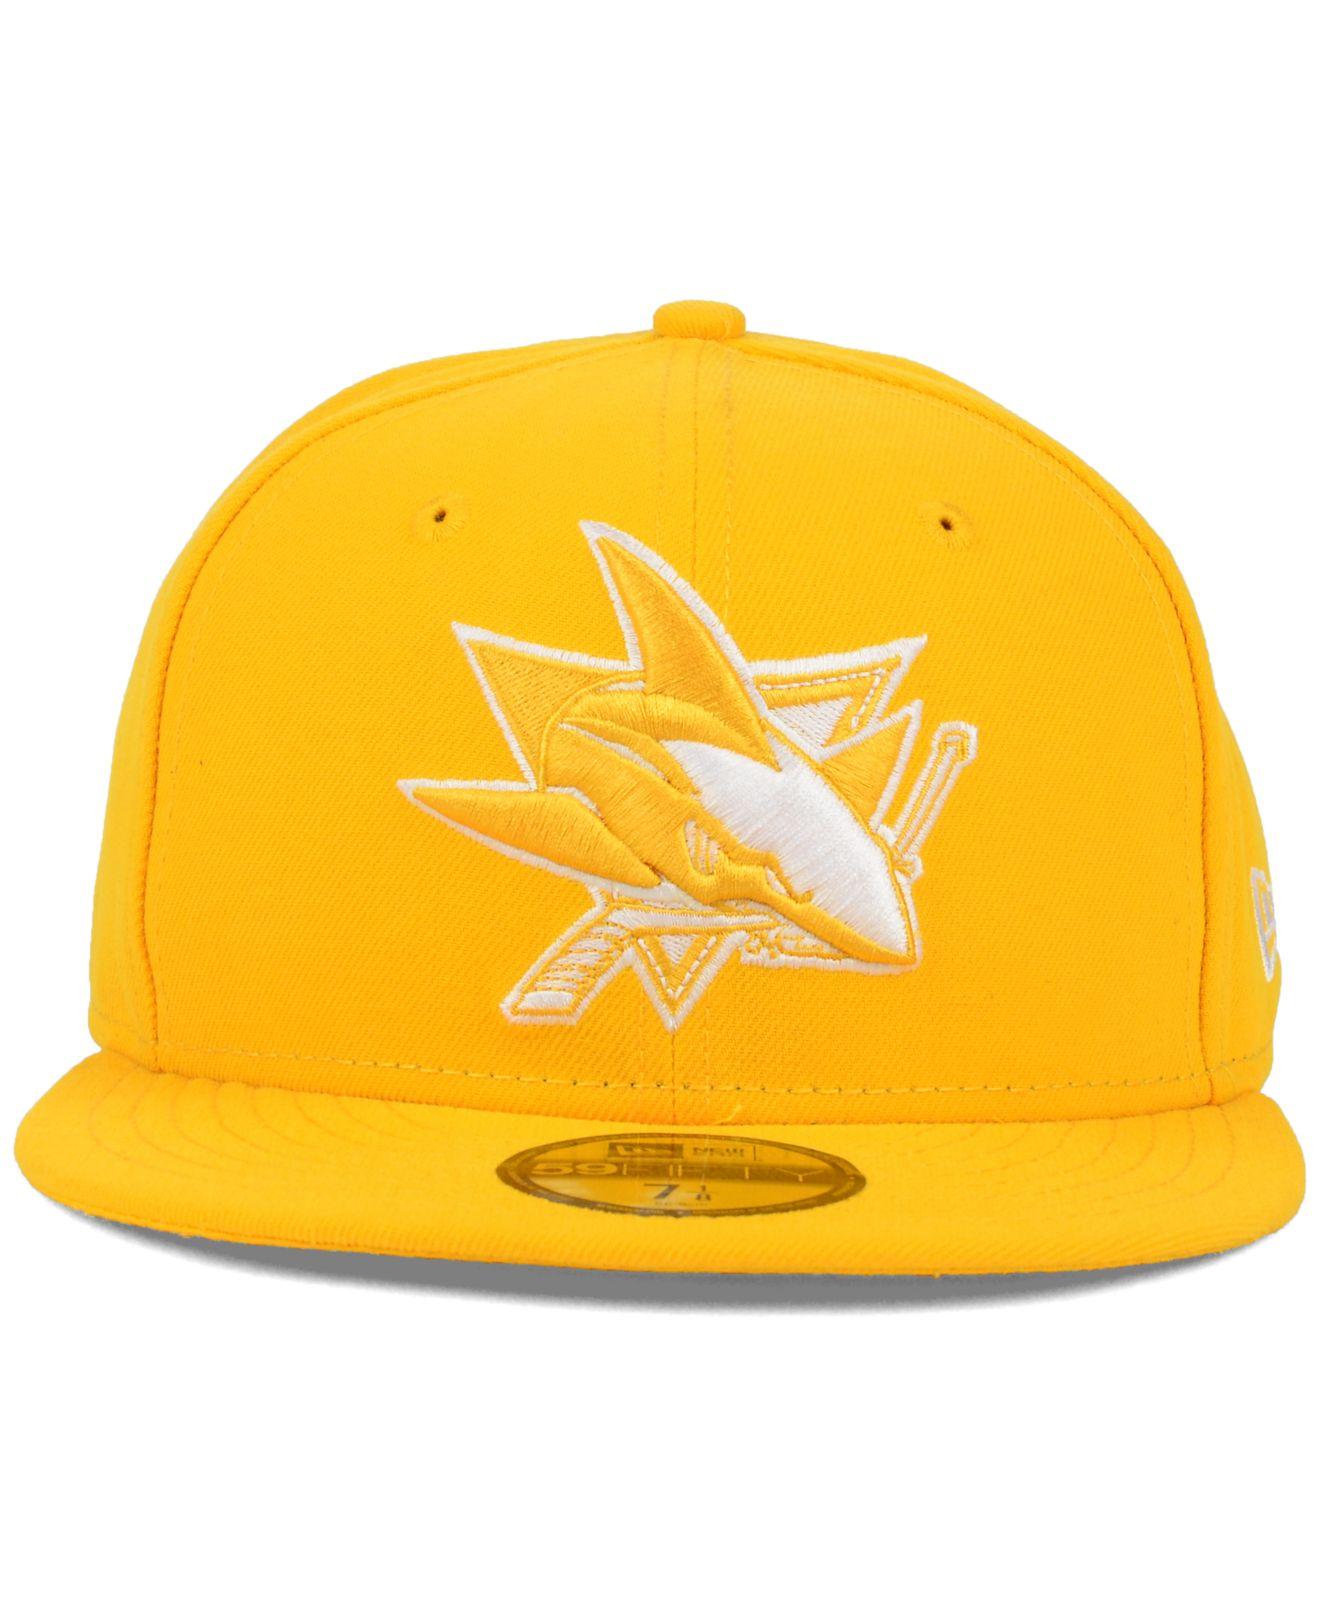 newest e293d d849f Lyst - KTZ San Jose Sharks C-dub 59fifty Cap in Yellow for Men